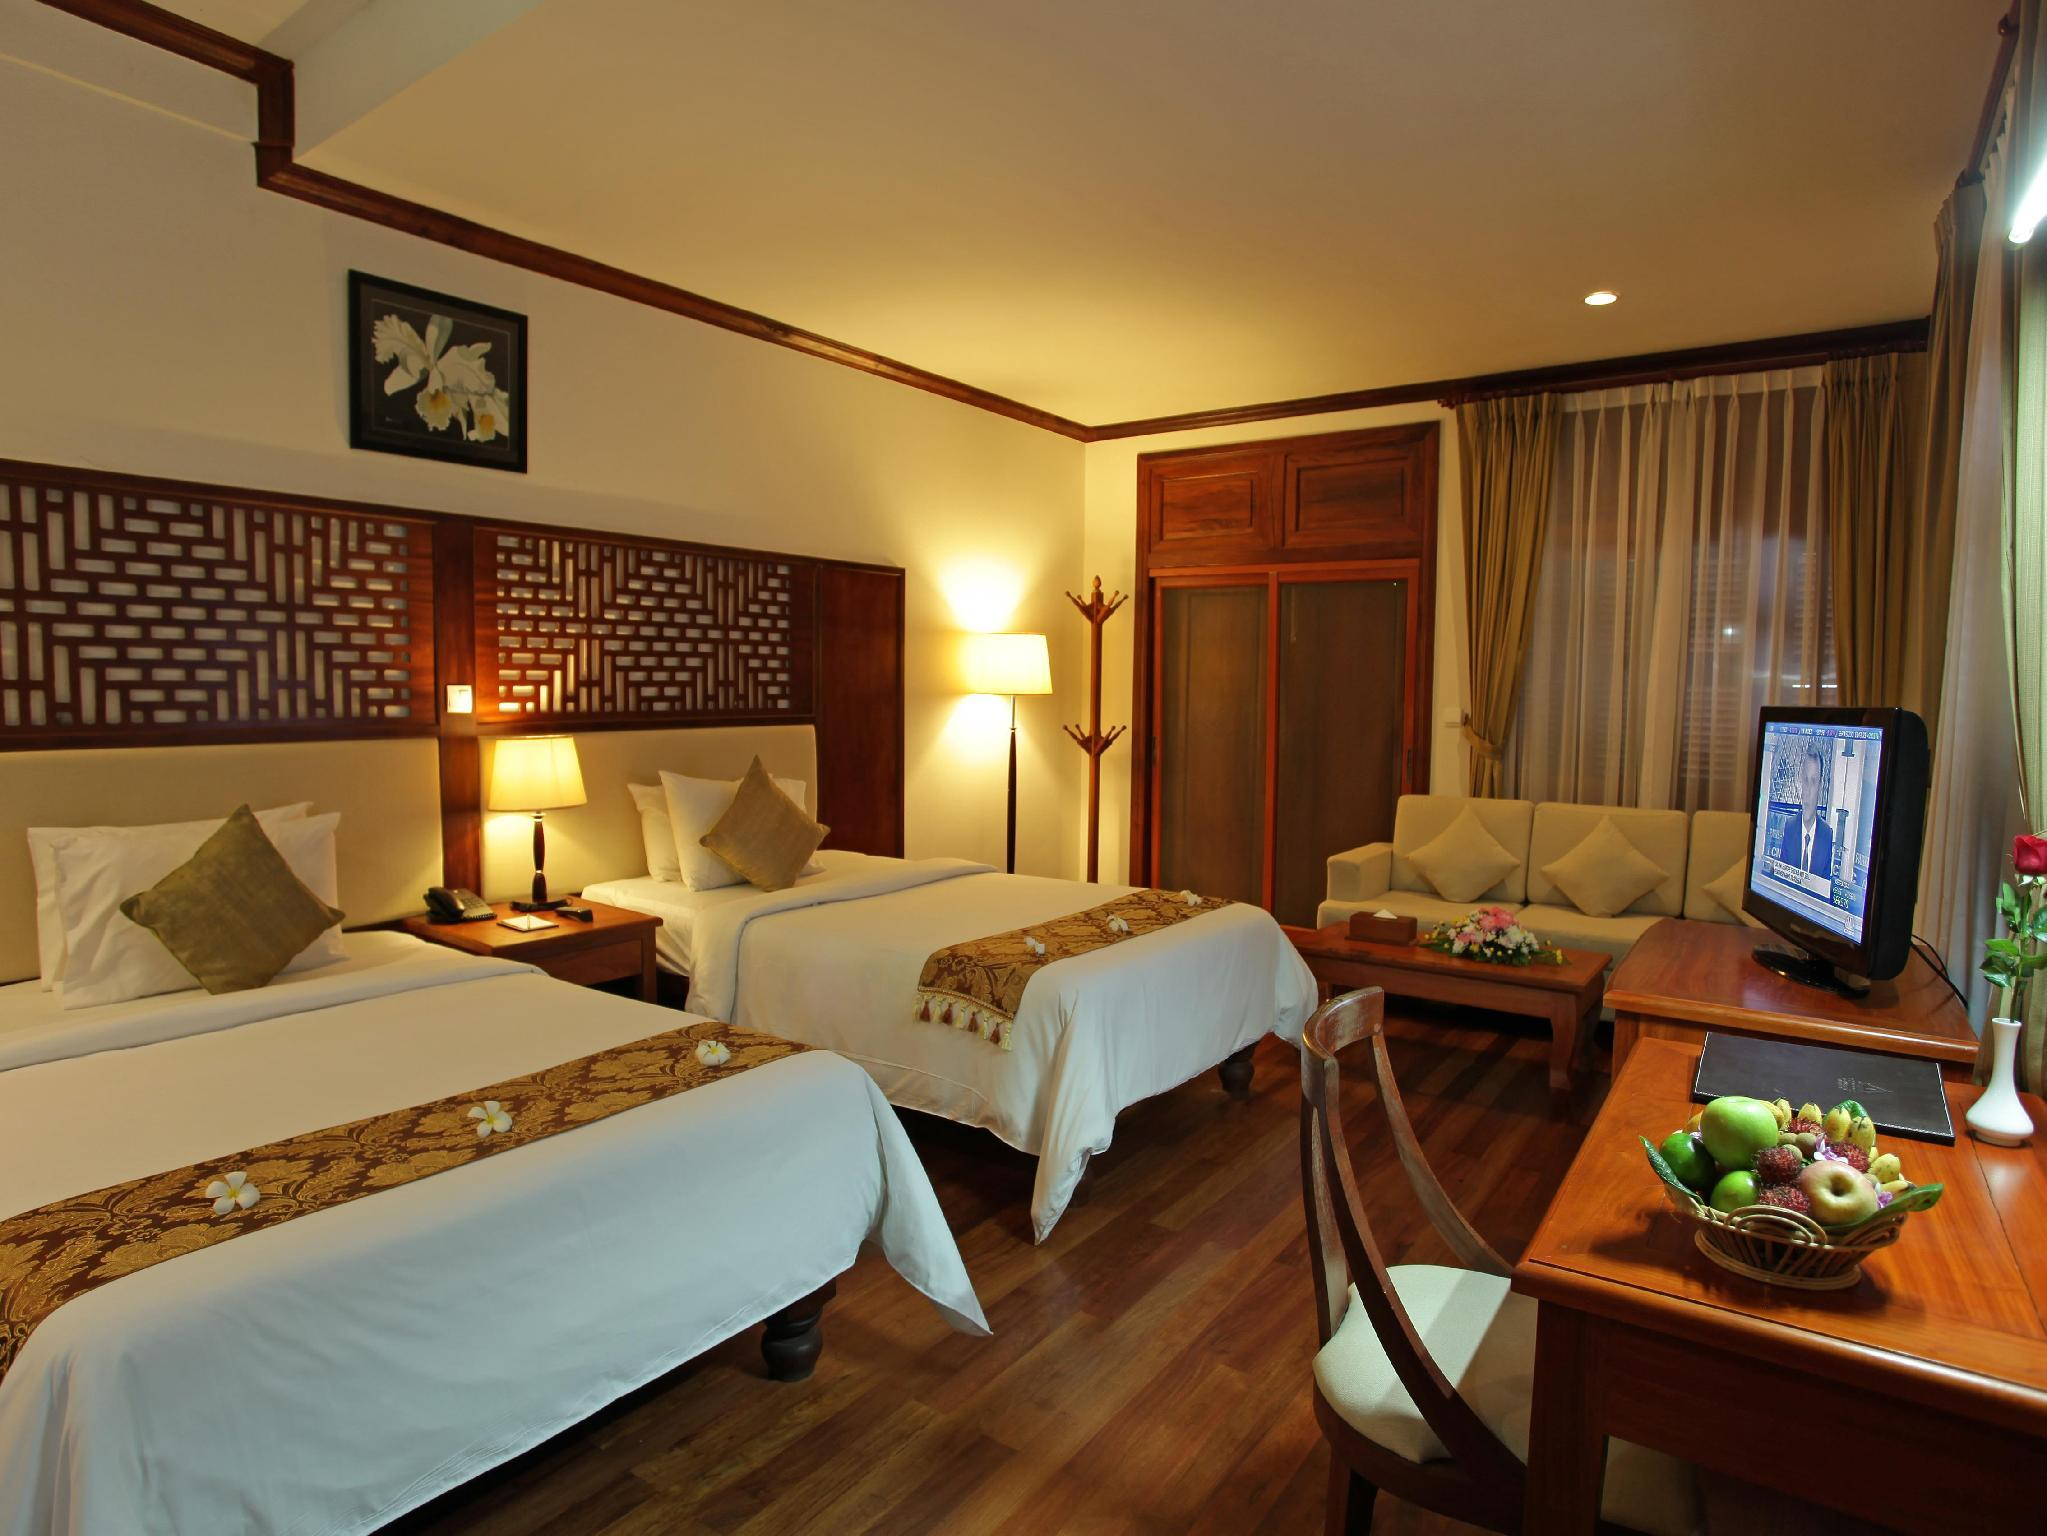 Sokhalay angkor villa resort i siem reap til bedste pris garanti ...